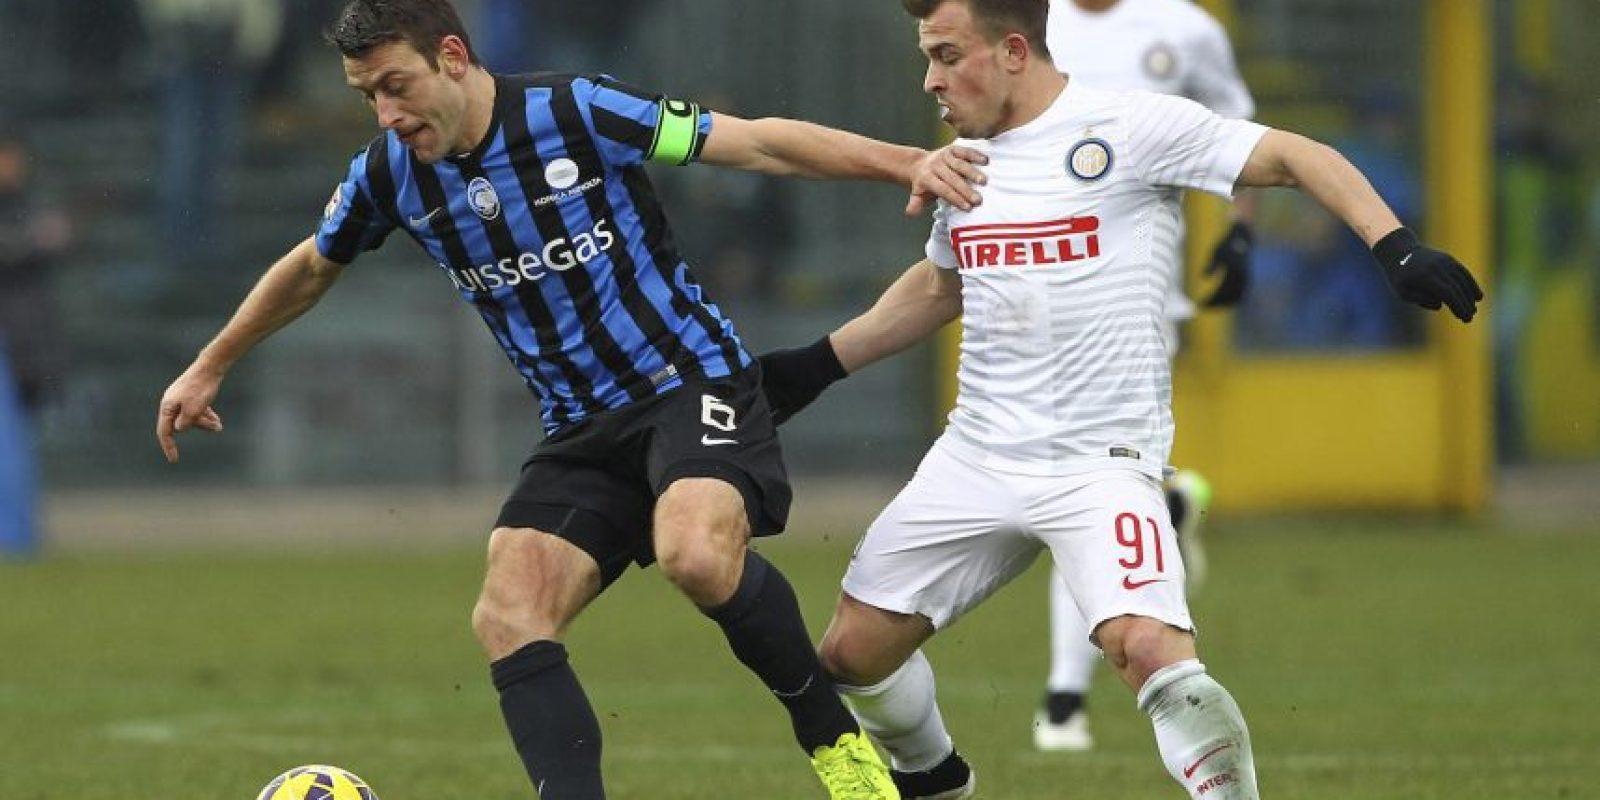 Internazionale vs. Atalanta / 20:45 horas de Italia / Estadio Giuseppe Meazza Foto:Getty Images